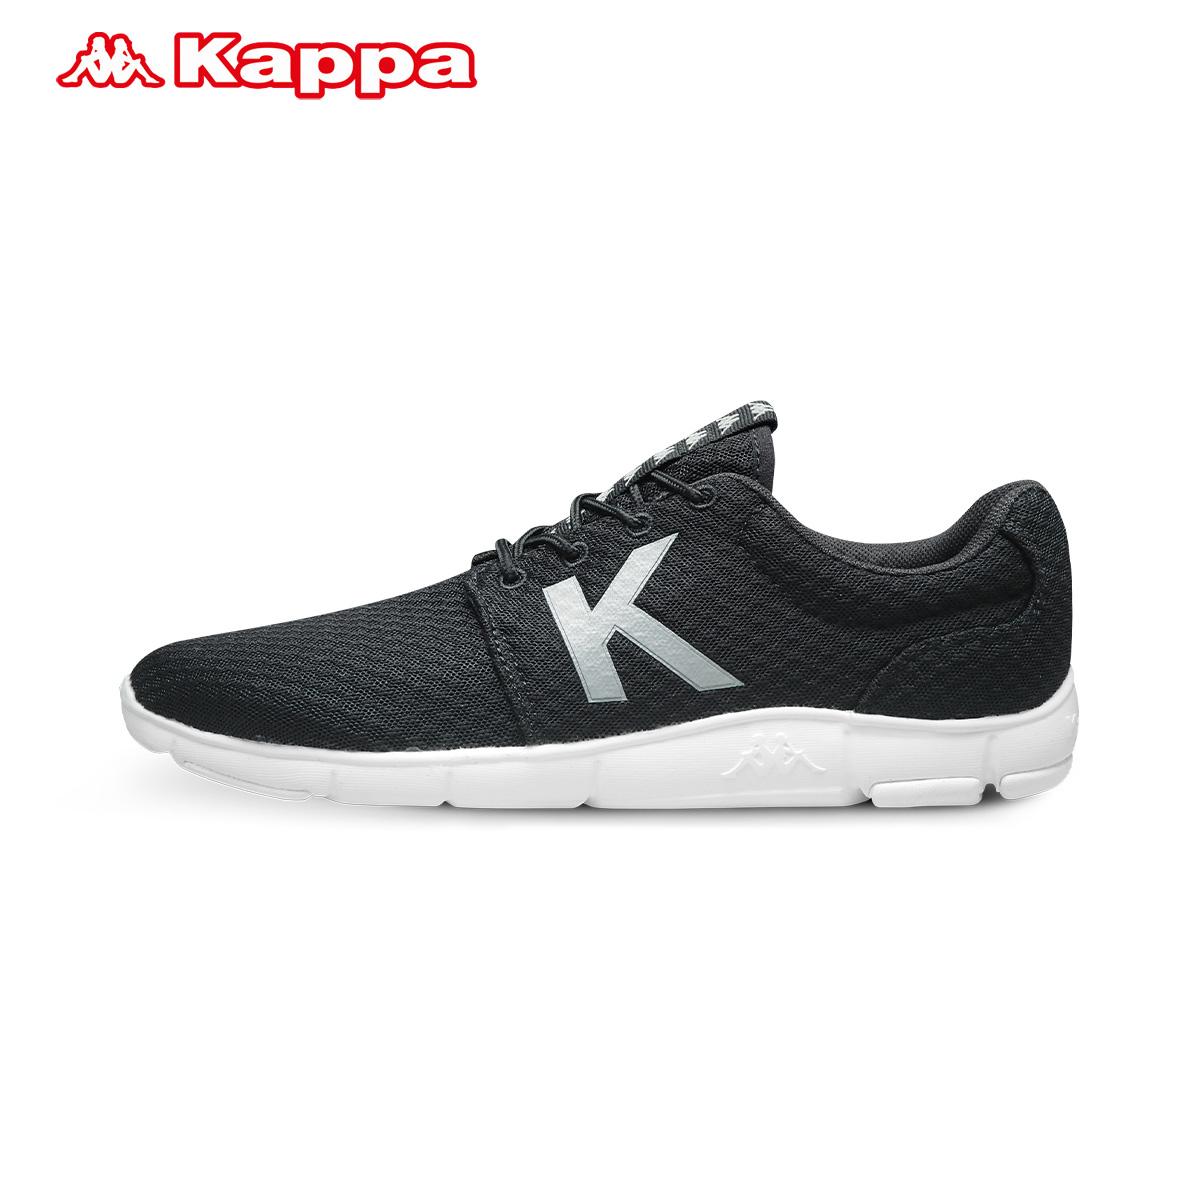 Pgm Kontra Baru Asli Sepatu Golf Hitam Daftar Update Harga Terbaru Adidas Pure 360 Gripmore Mens Shoes Biru Flash Sale Kappa K0715mq69 Pria